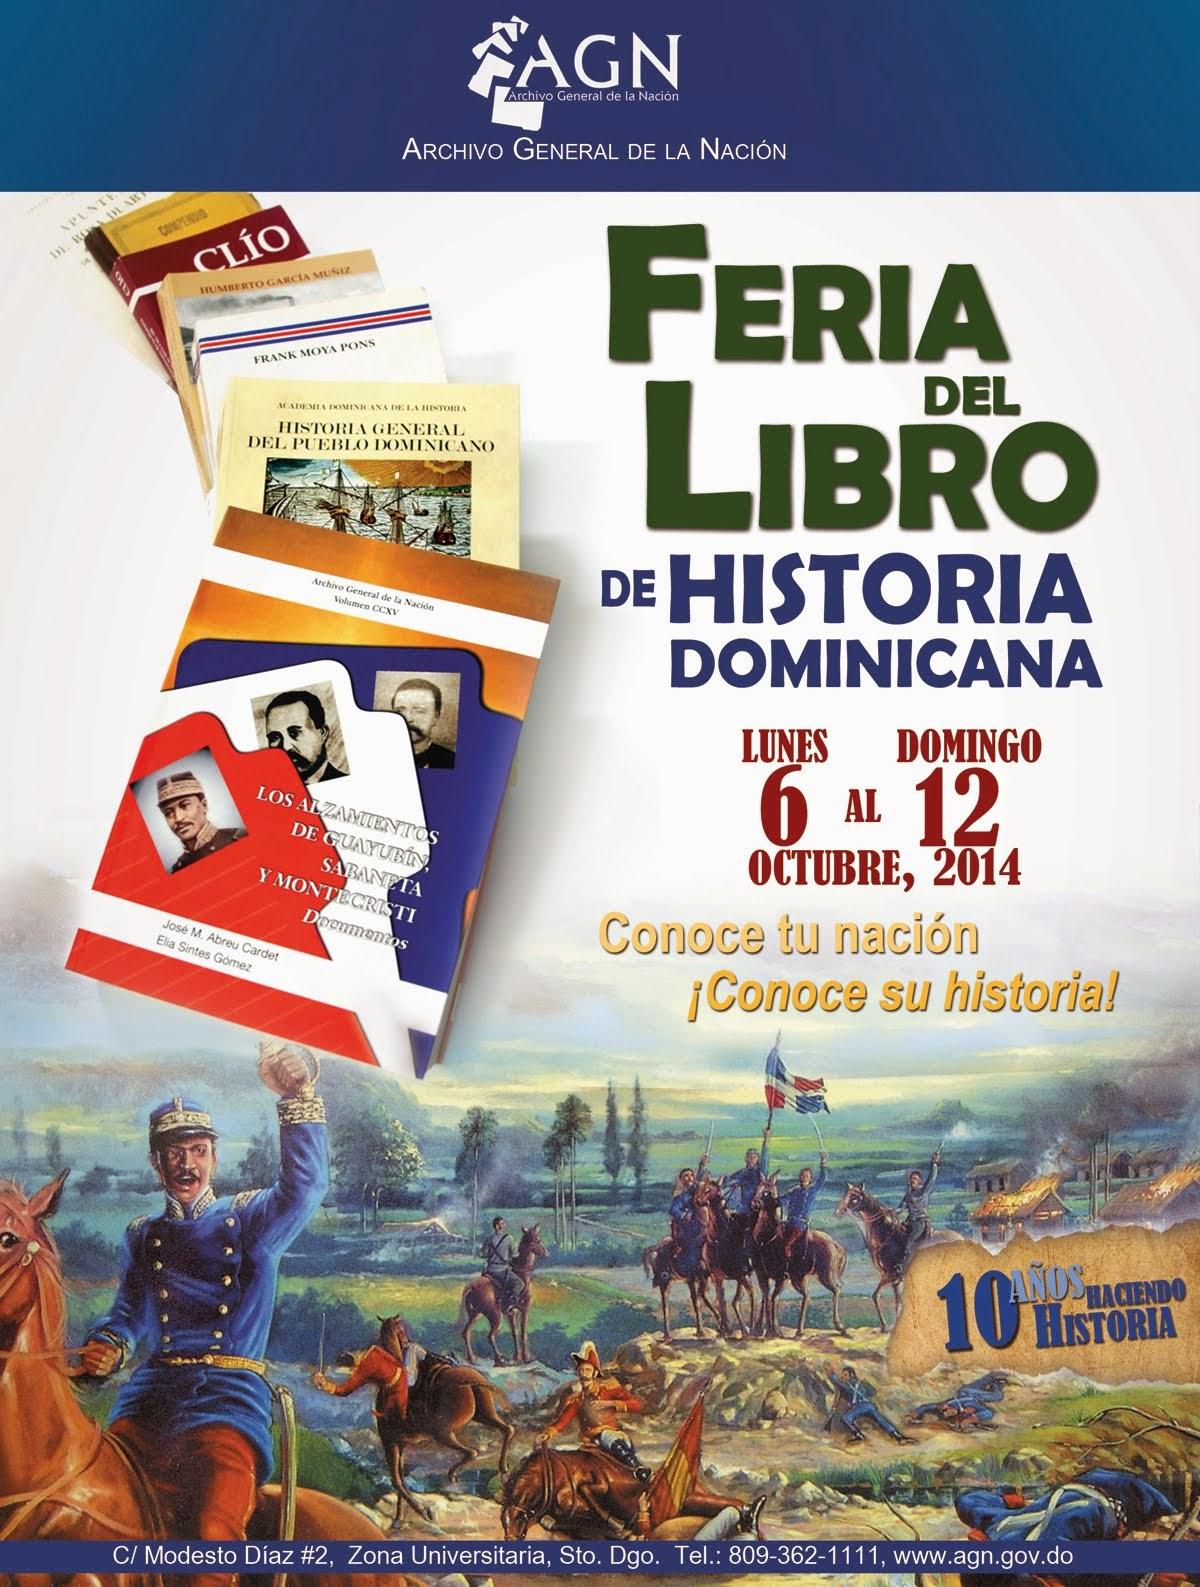 Feria del Libro de Historia Dominicana